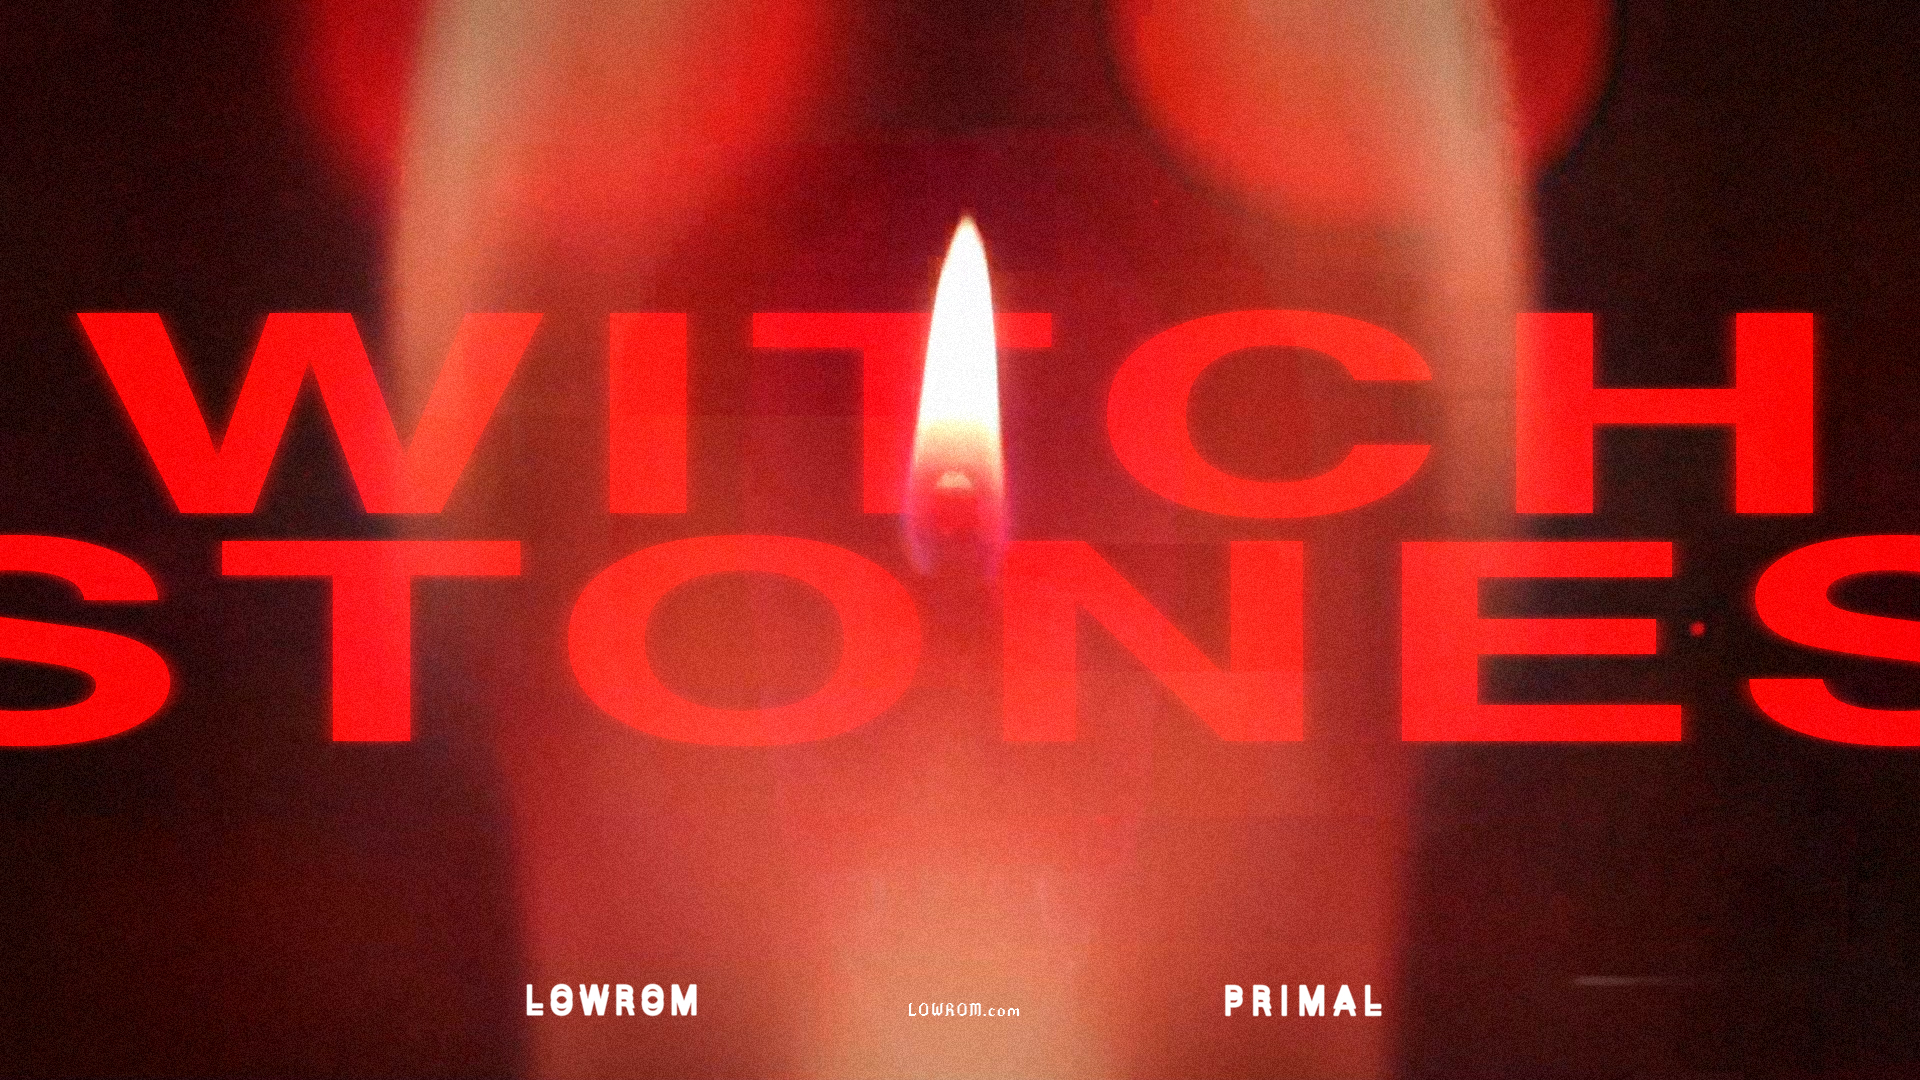 LOWROM - Witch Stones